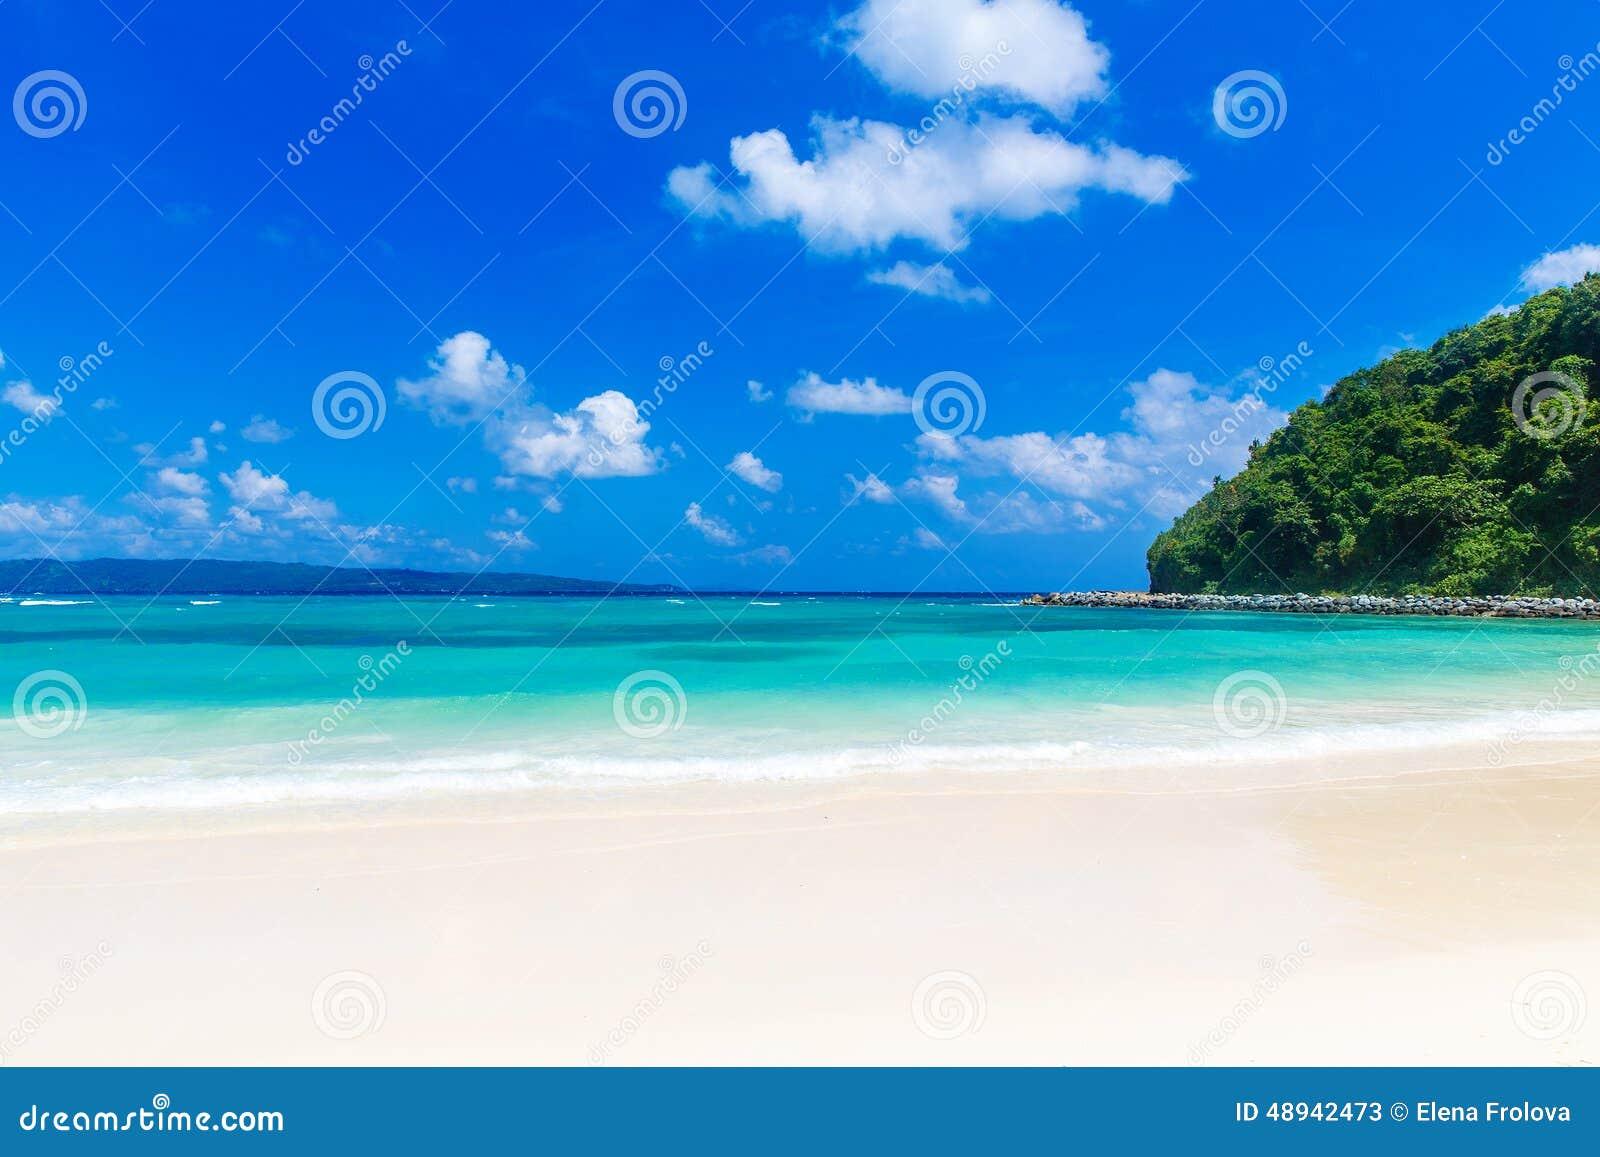 Dream scene. Beautiful white sand beach, the tropical sea . Summer view of nature.